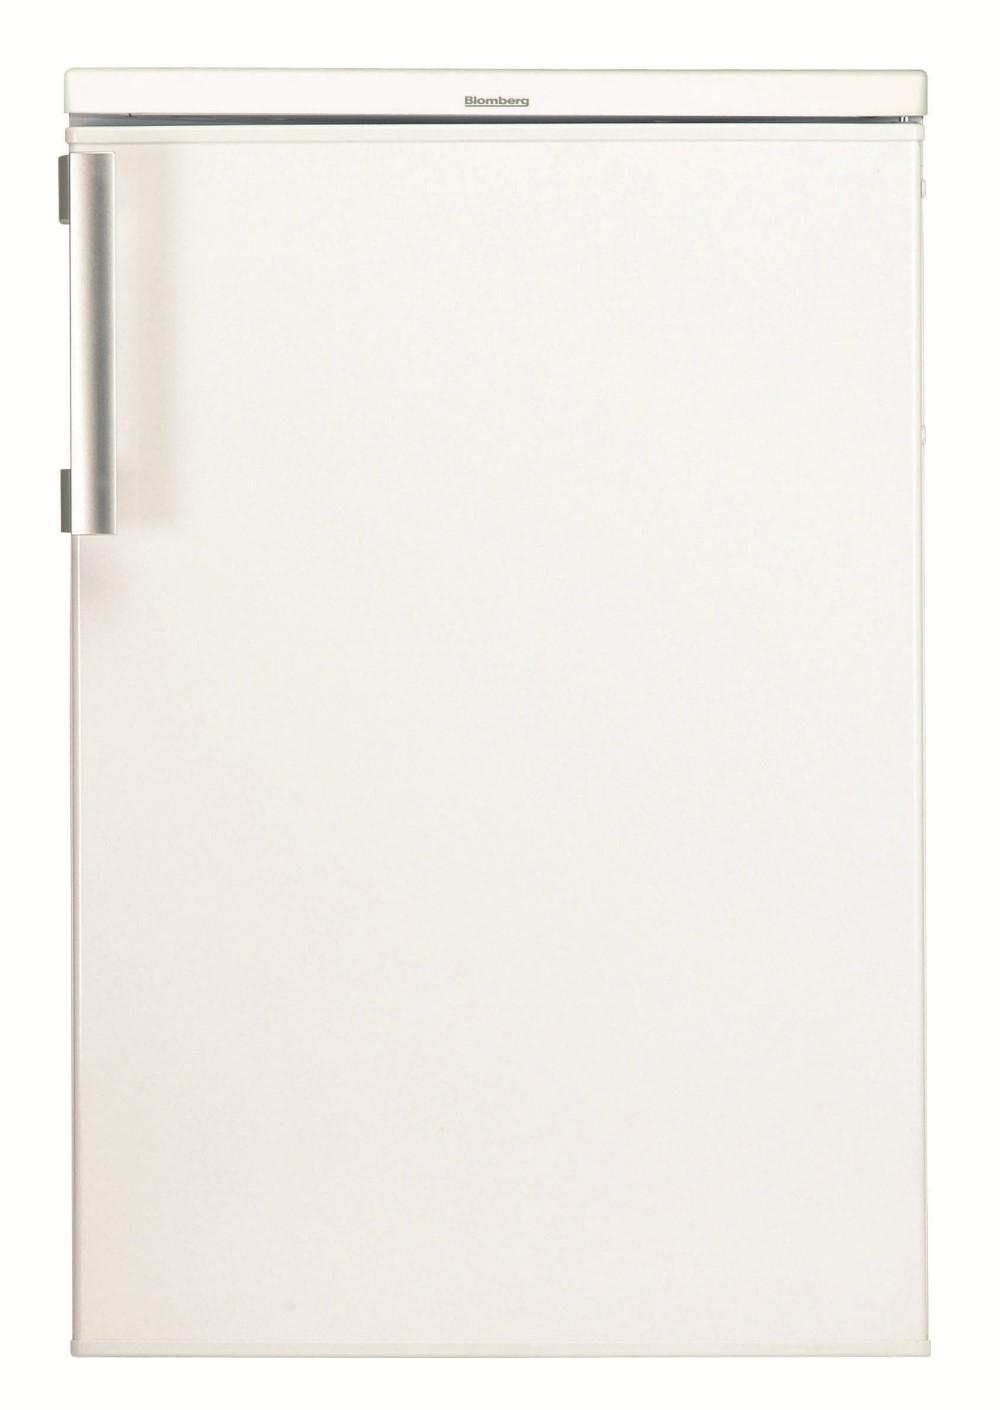 Blomberg TSM1541 A+++ Tisch-Kühlschrank/ Energieeffizienzklasse A+++